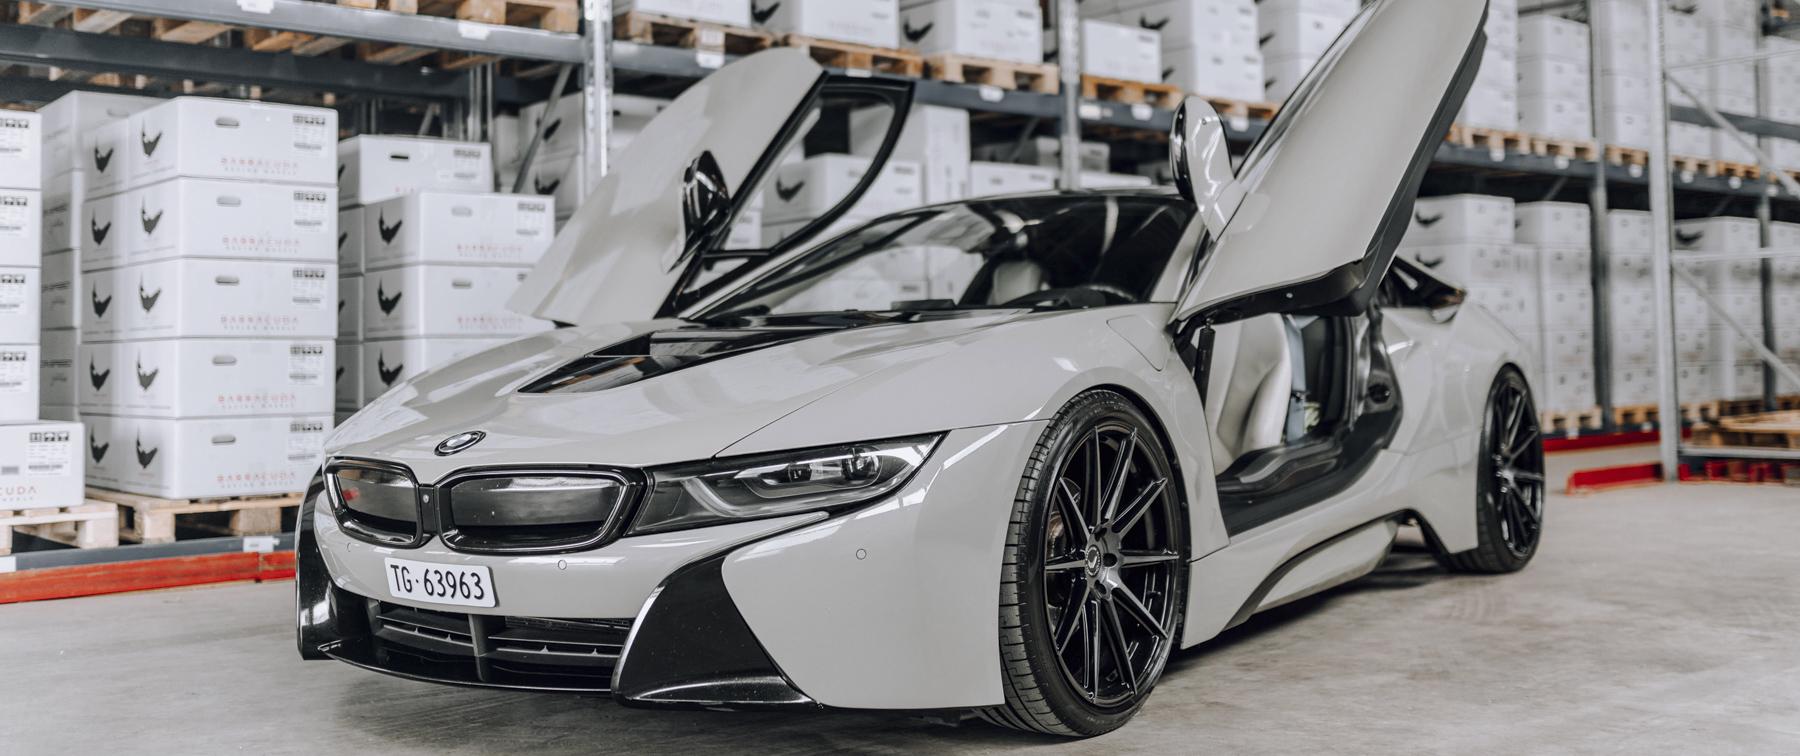 BMW – i8 – Grau – BARRACUDA – Ultralight Project 2.0 – Finish Black – 22 Zoll